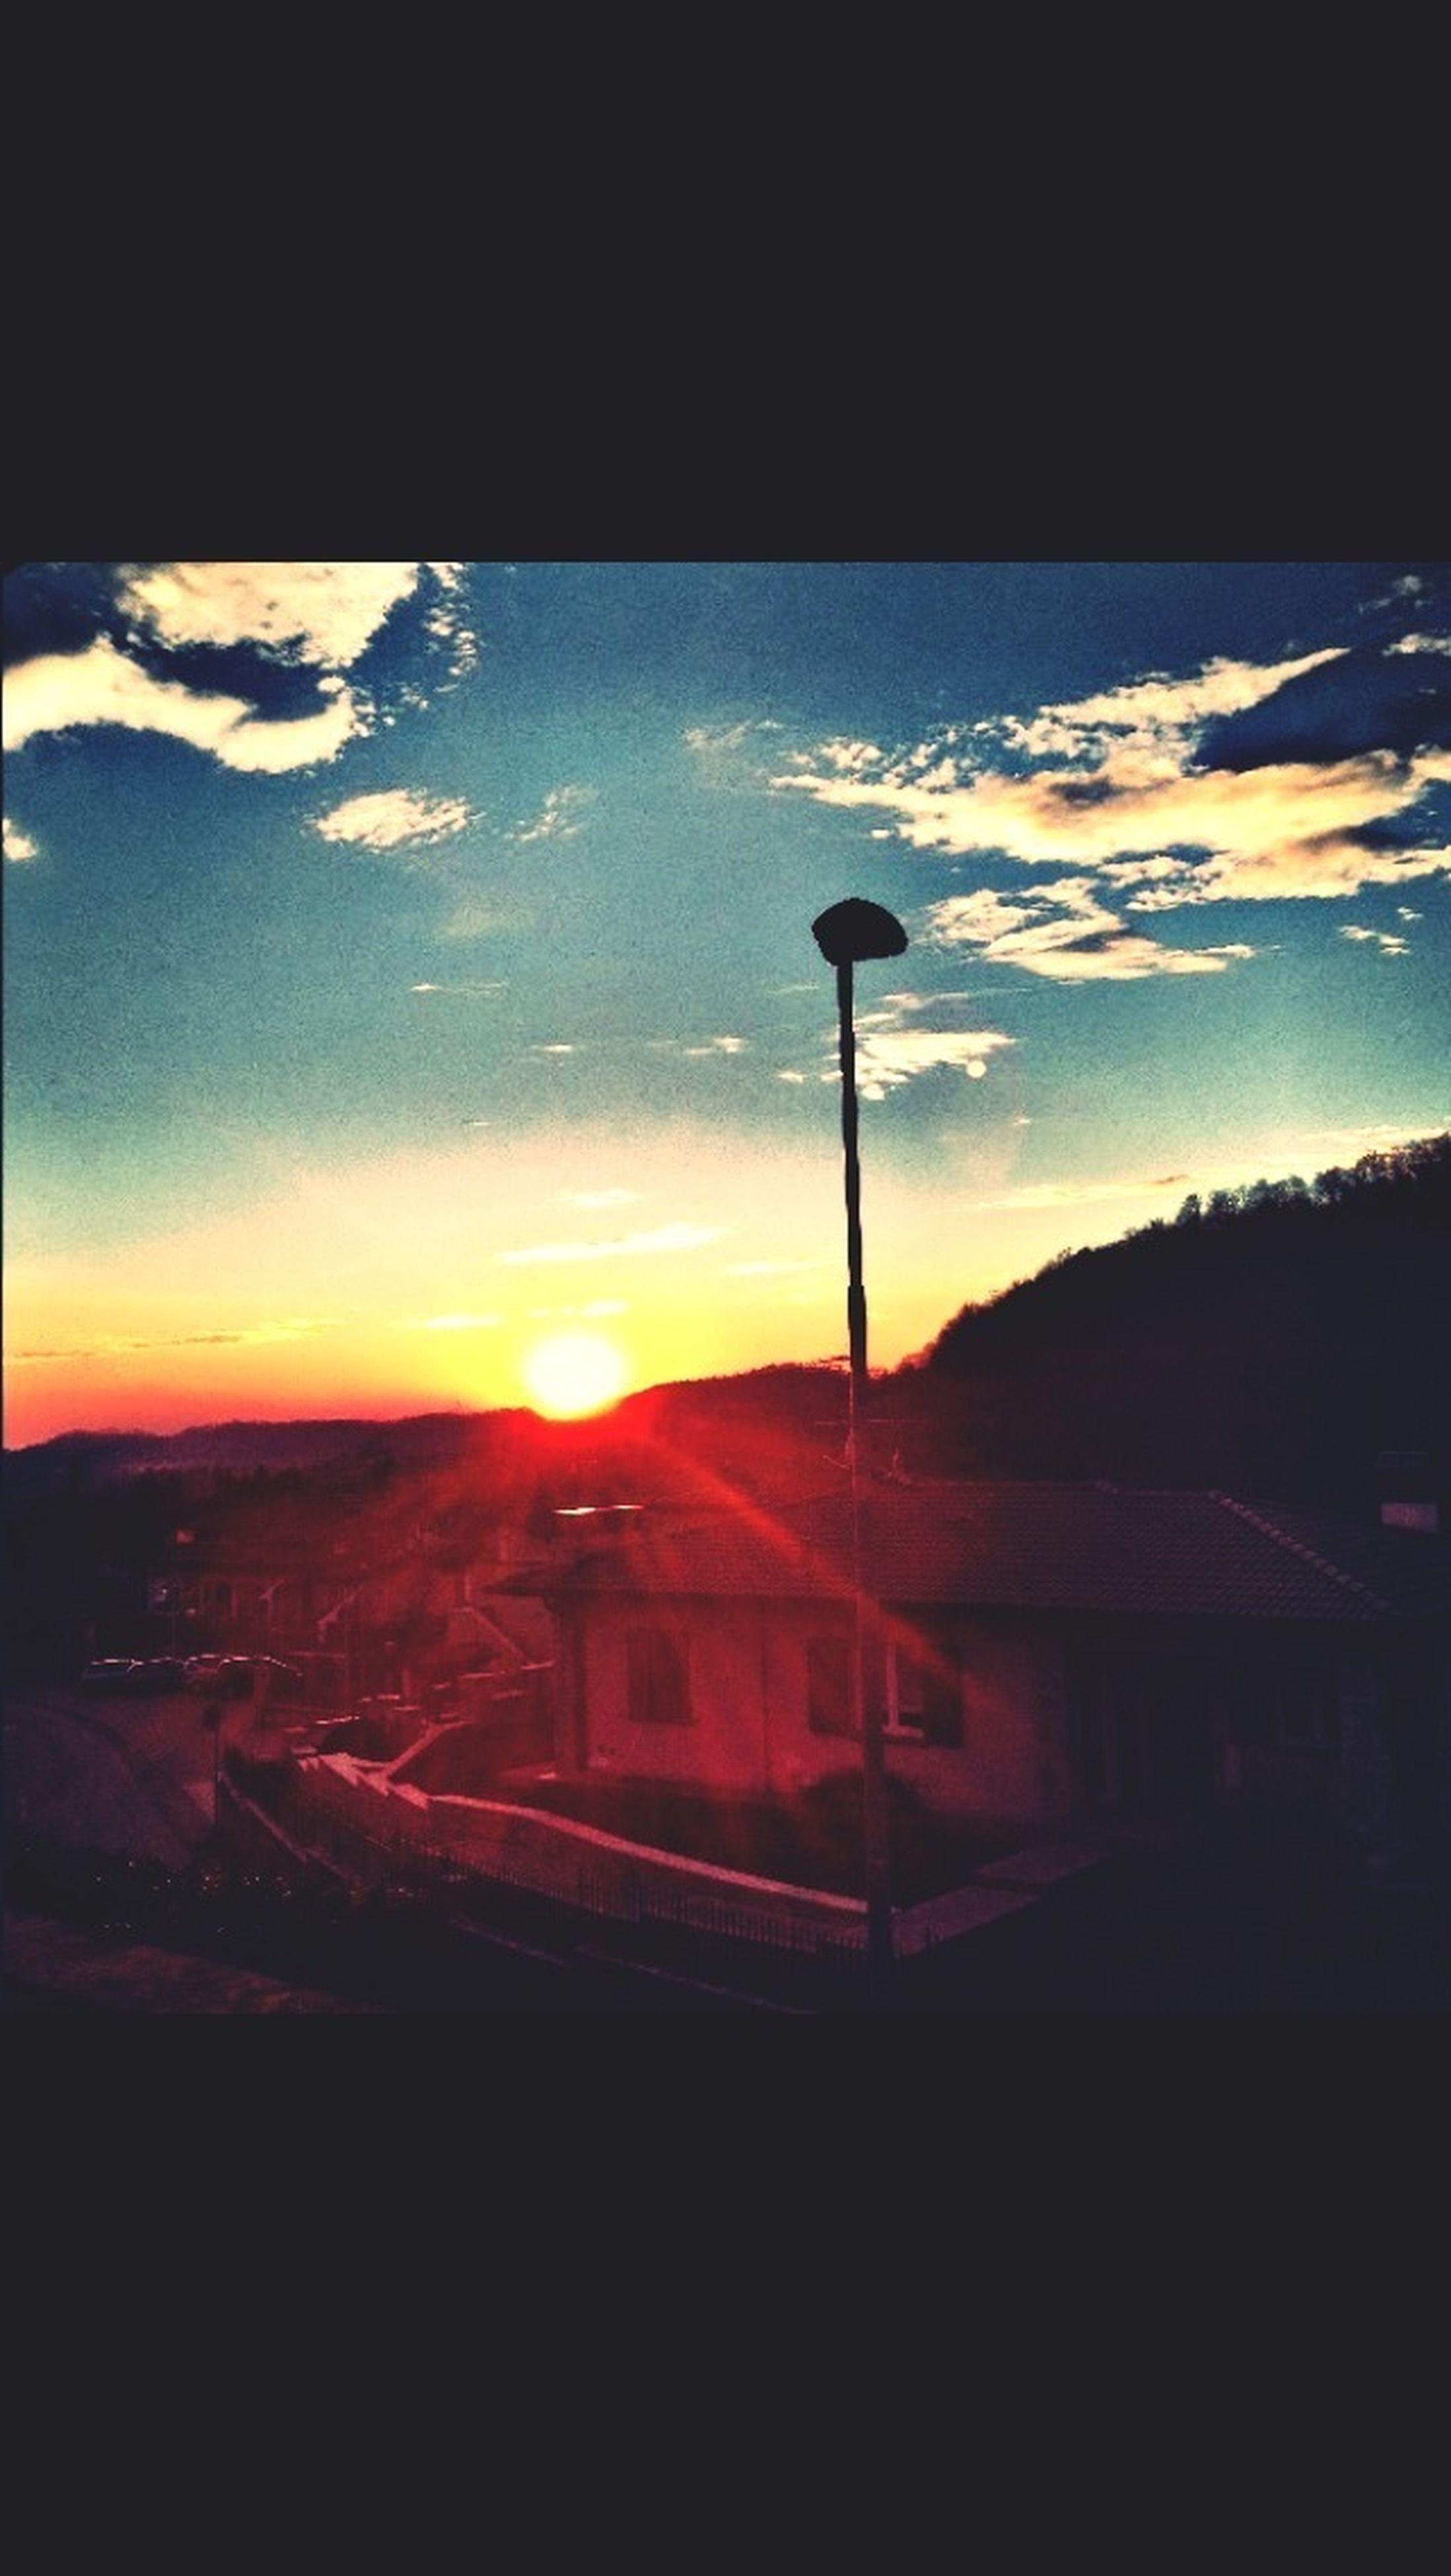 sunset, sky, transportation, silhouette, cloud - sky, sun, built structure, orange color, architecture, street light, dark, car, building exterior, mode of transport, dusk, sunlight, auto post production filter, landscape, land vehicle, cloud